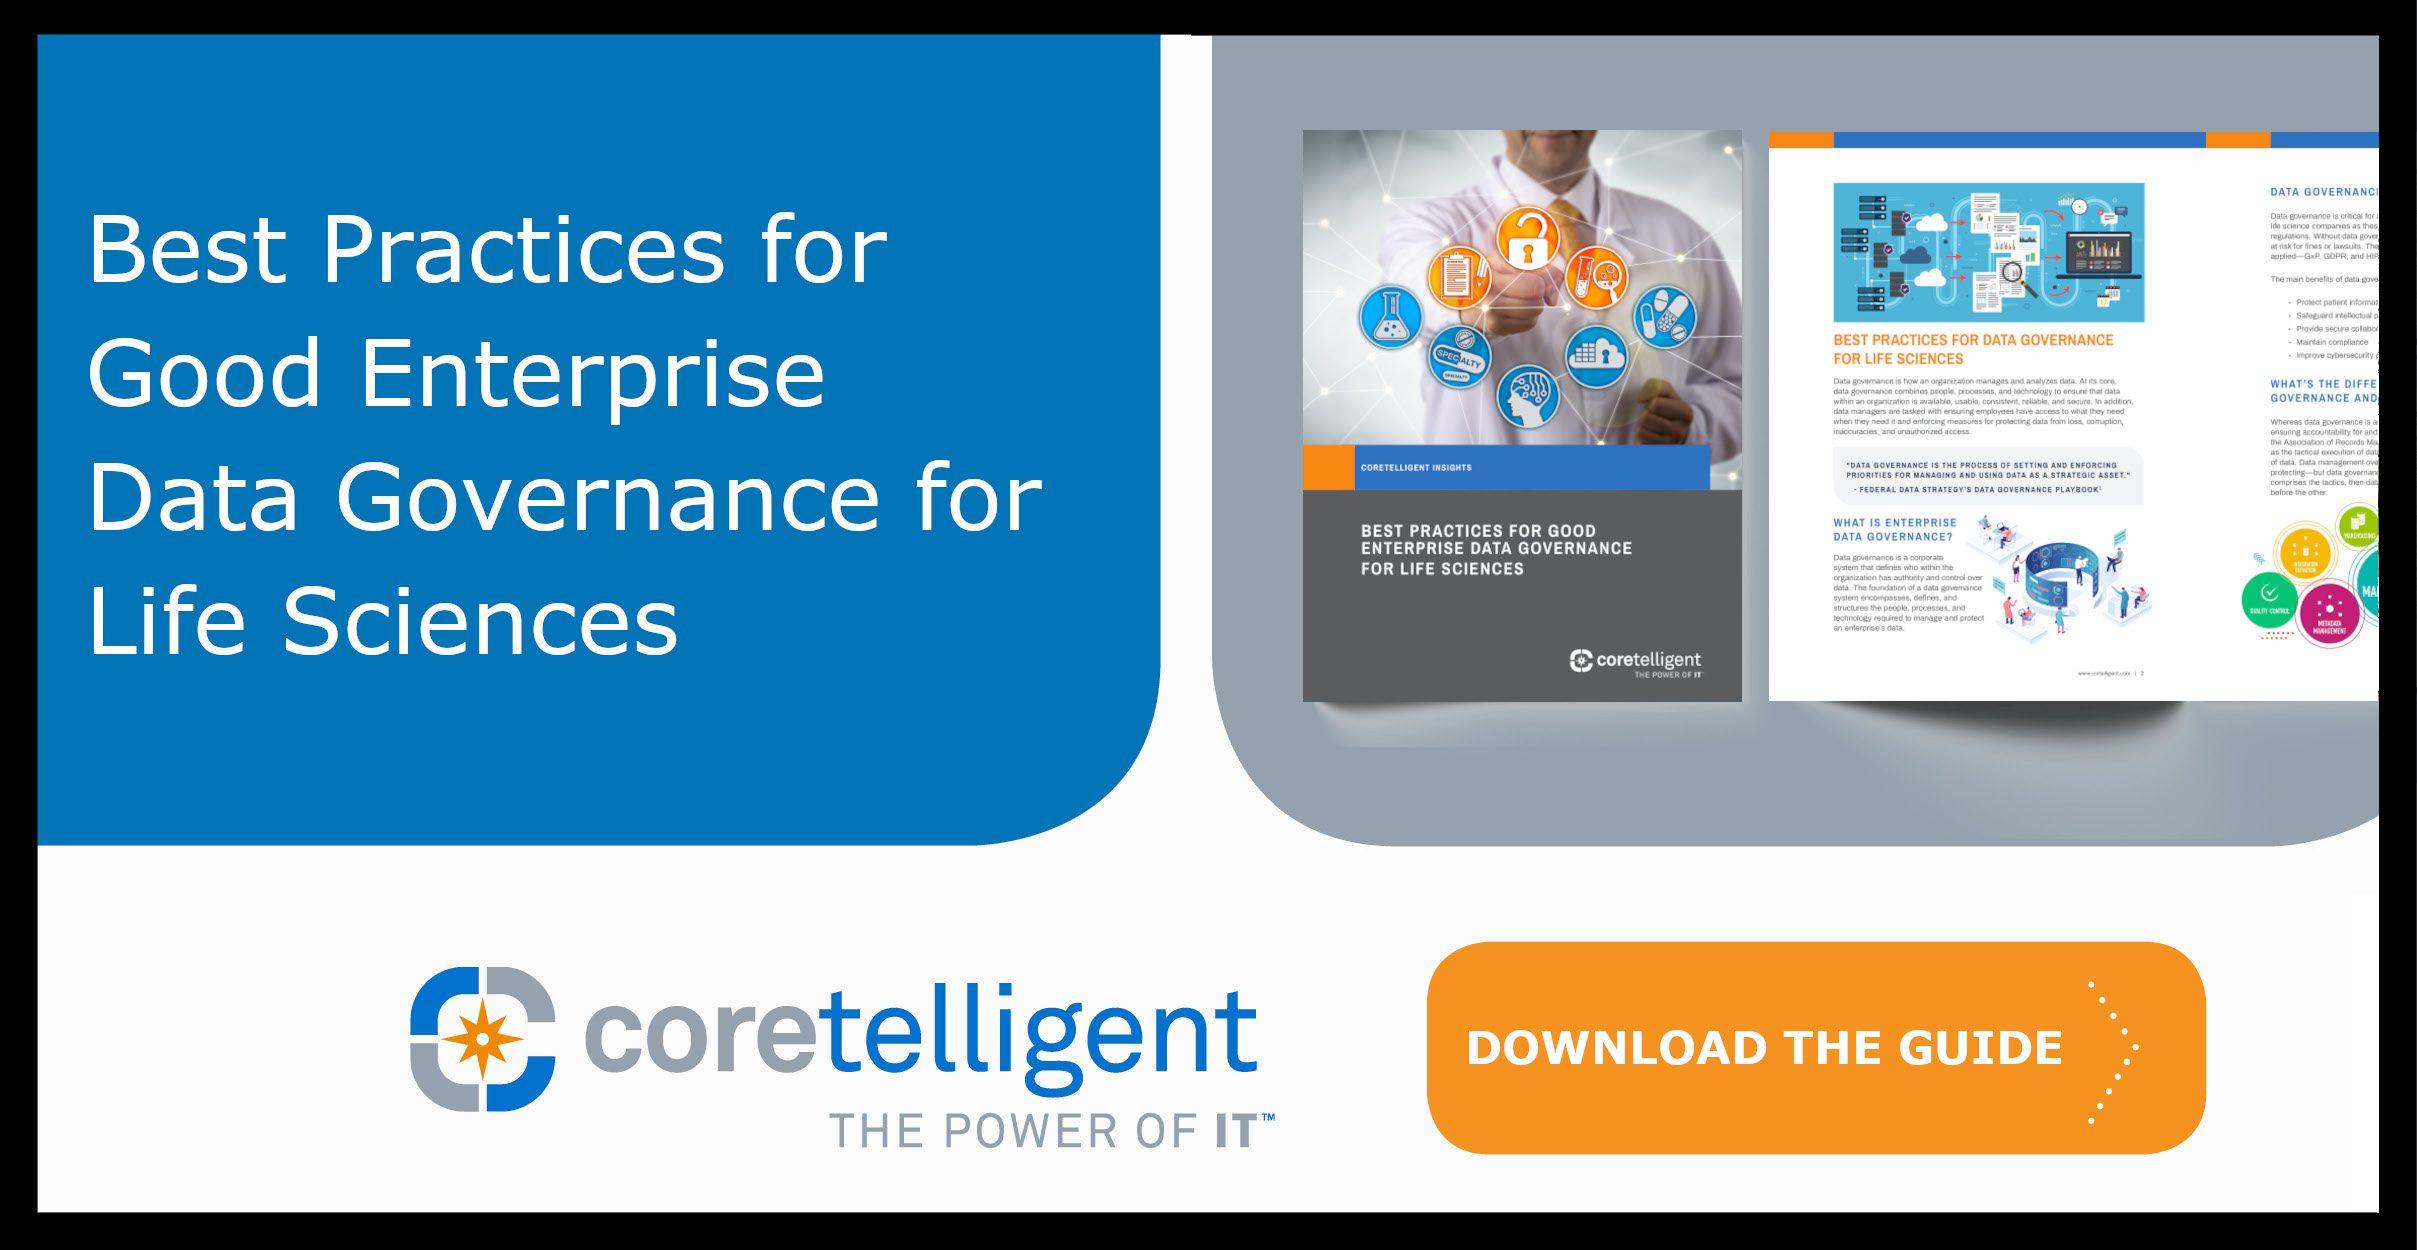 Best Practices for Good Enterprise Data Governance for Life Sciences